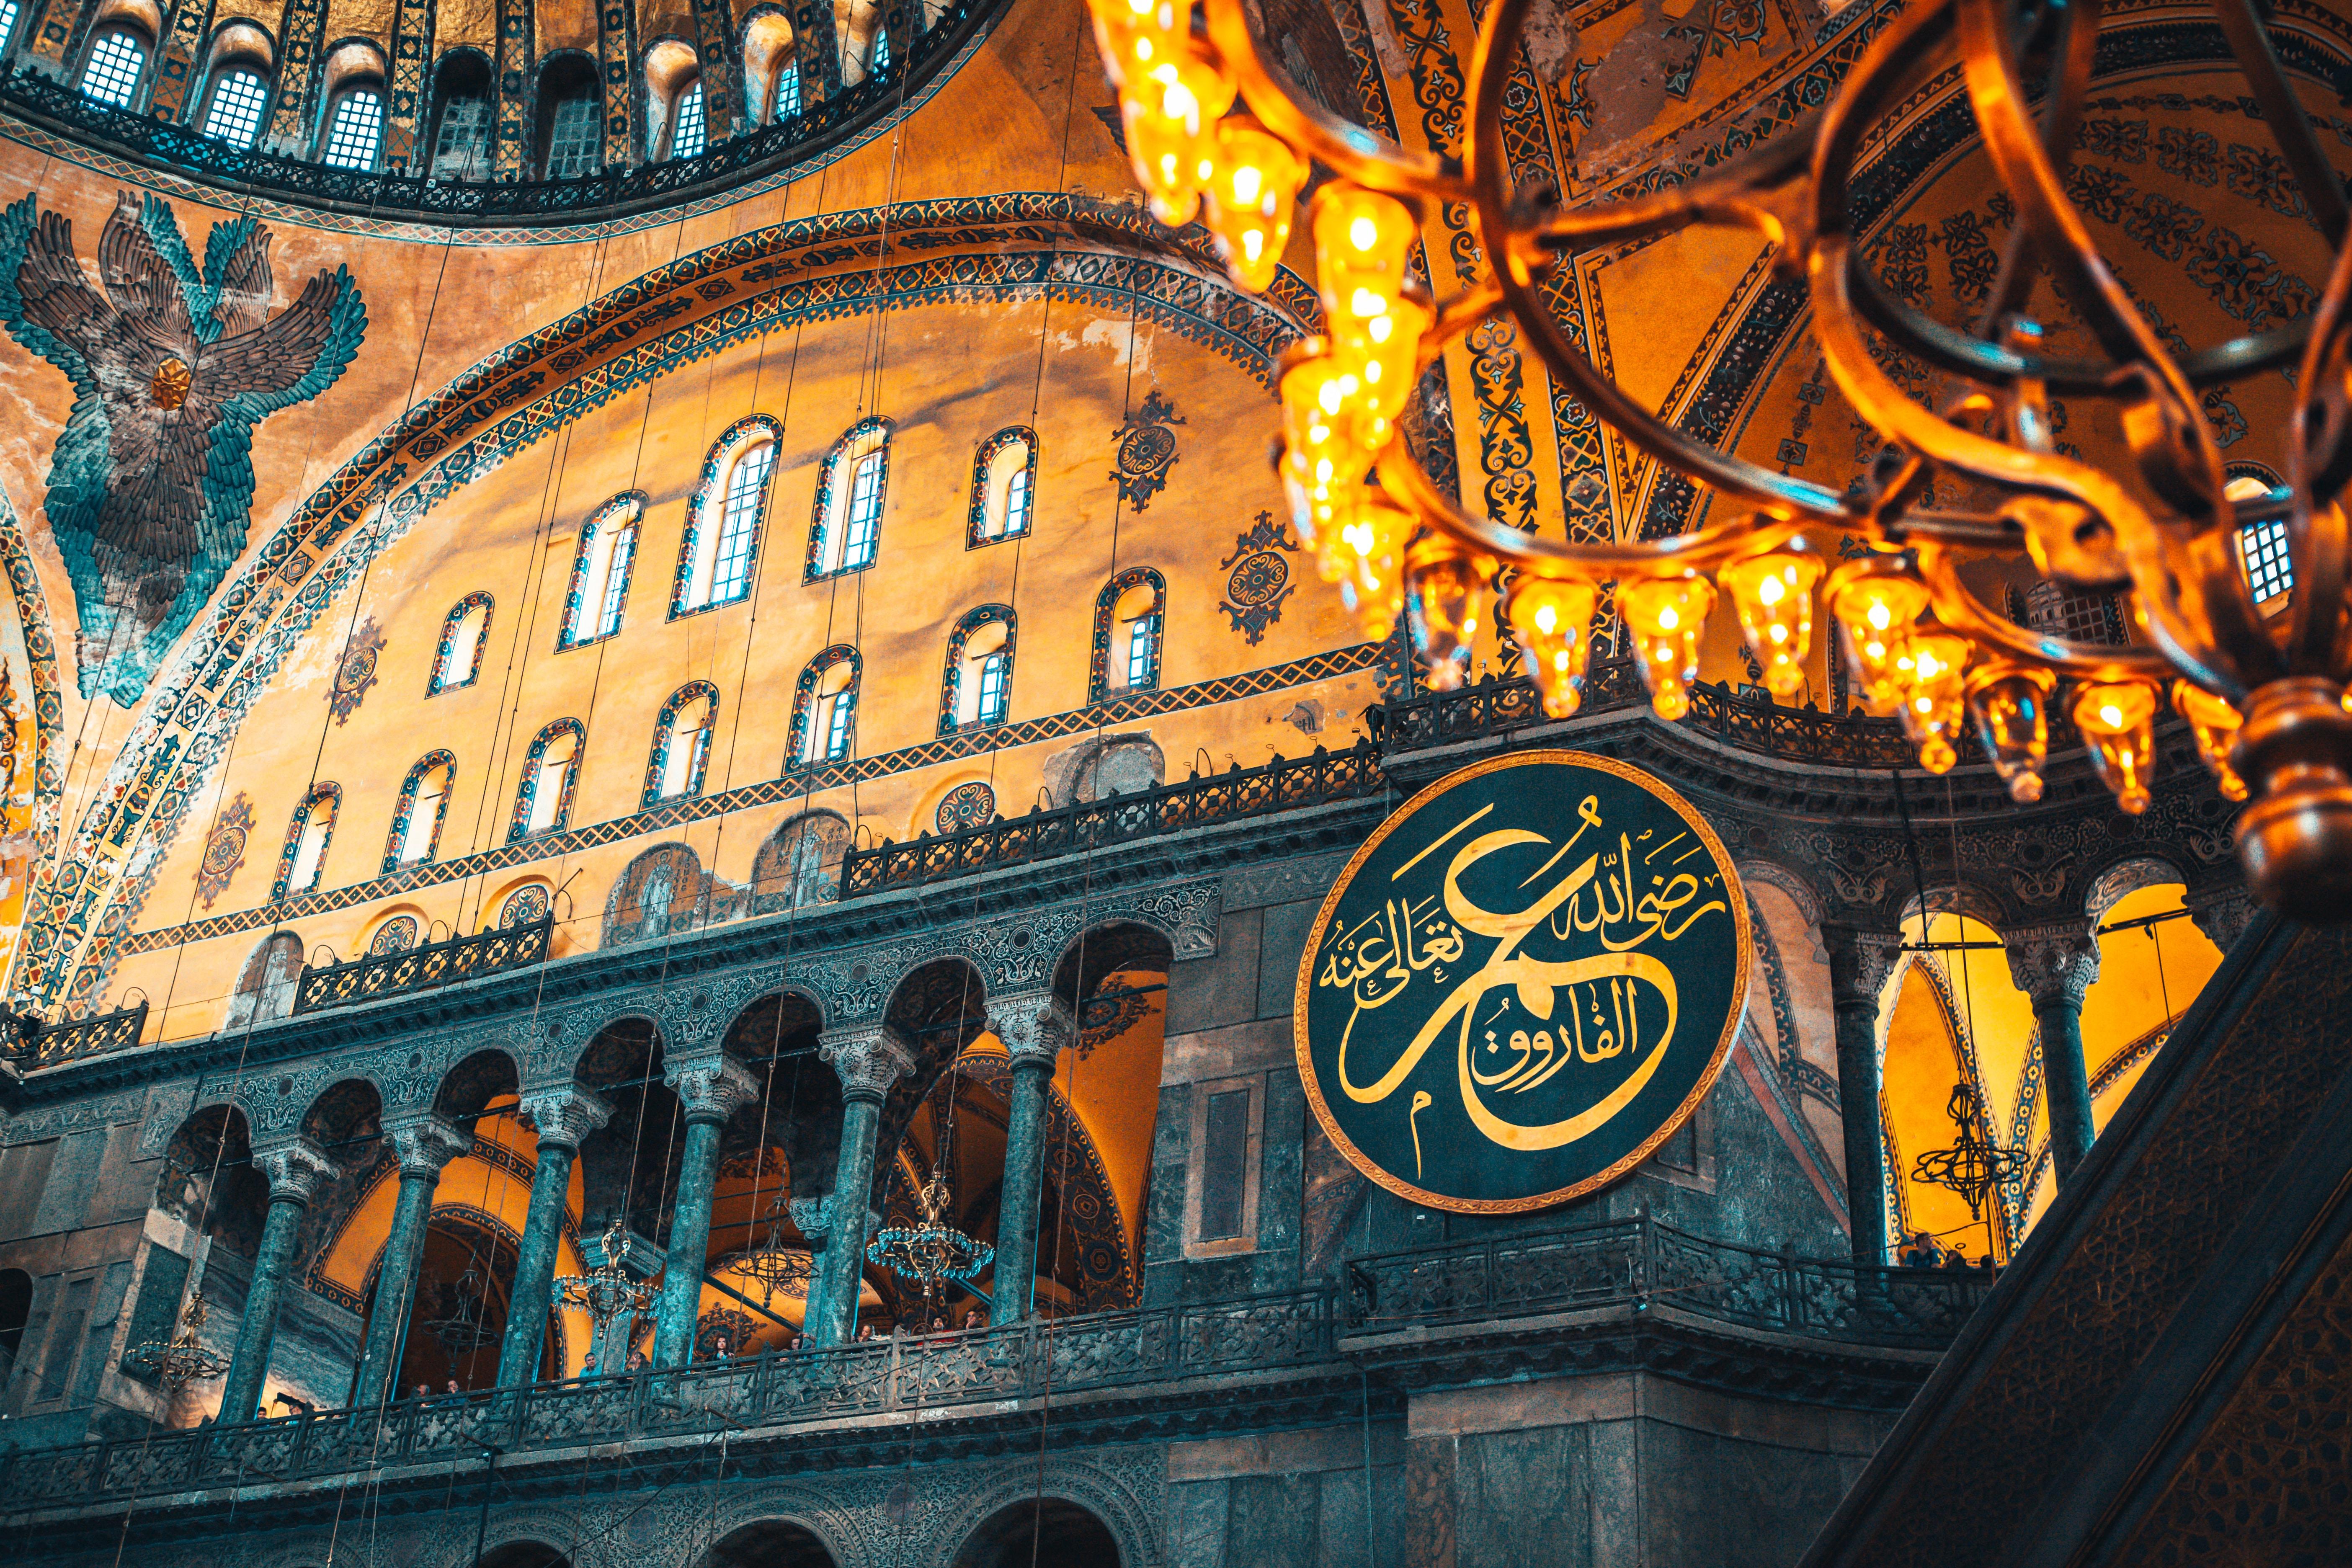 Interior of Ayasofya Hagia Sophia Istanbul Constantinople Christian patriarchal basilica